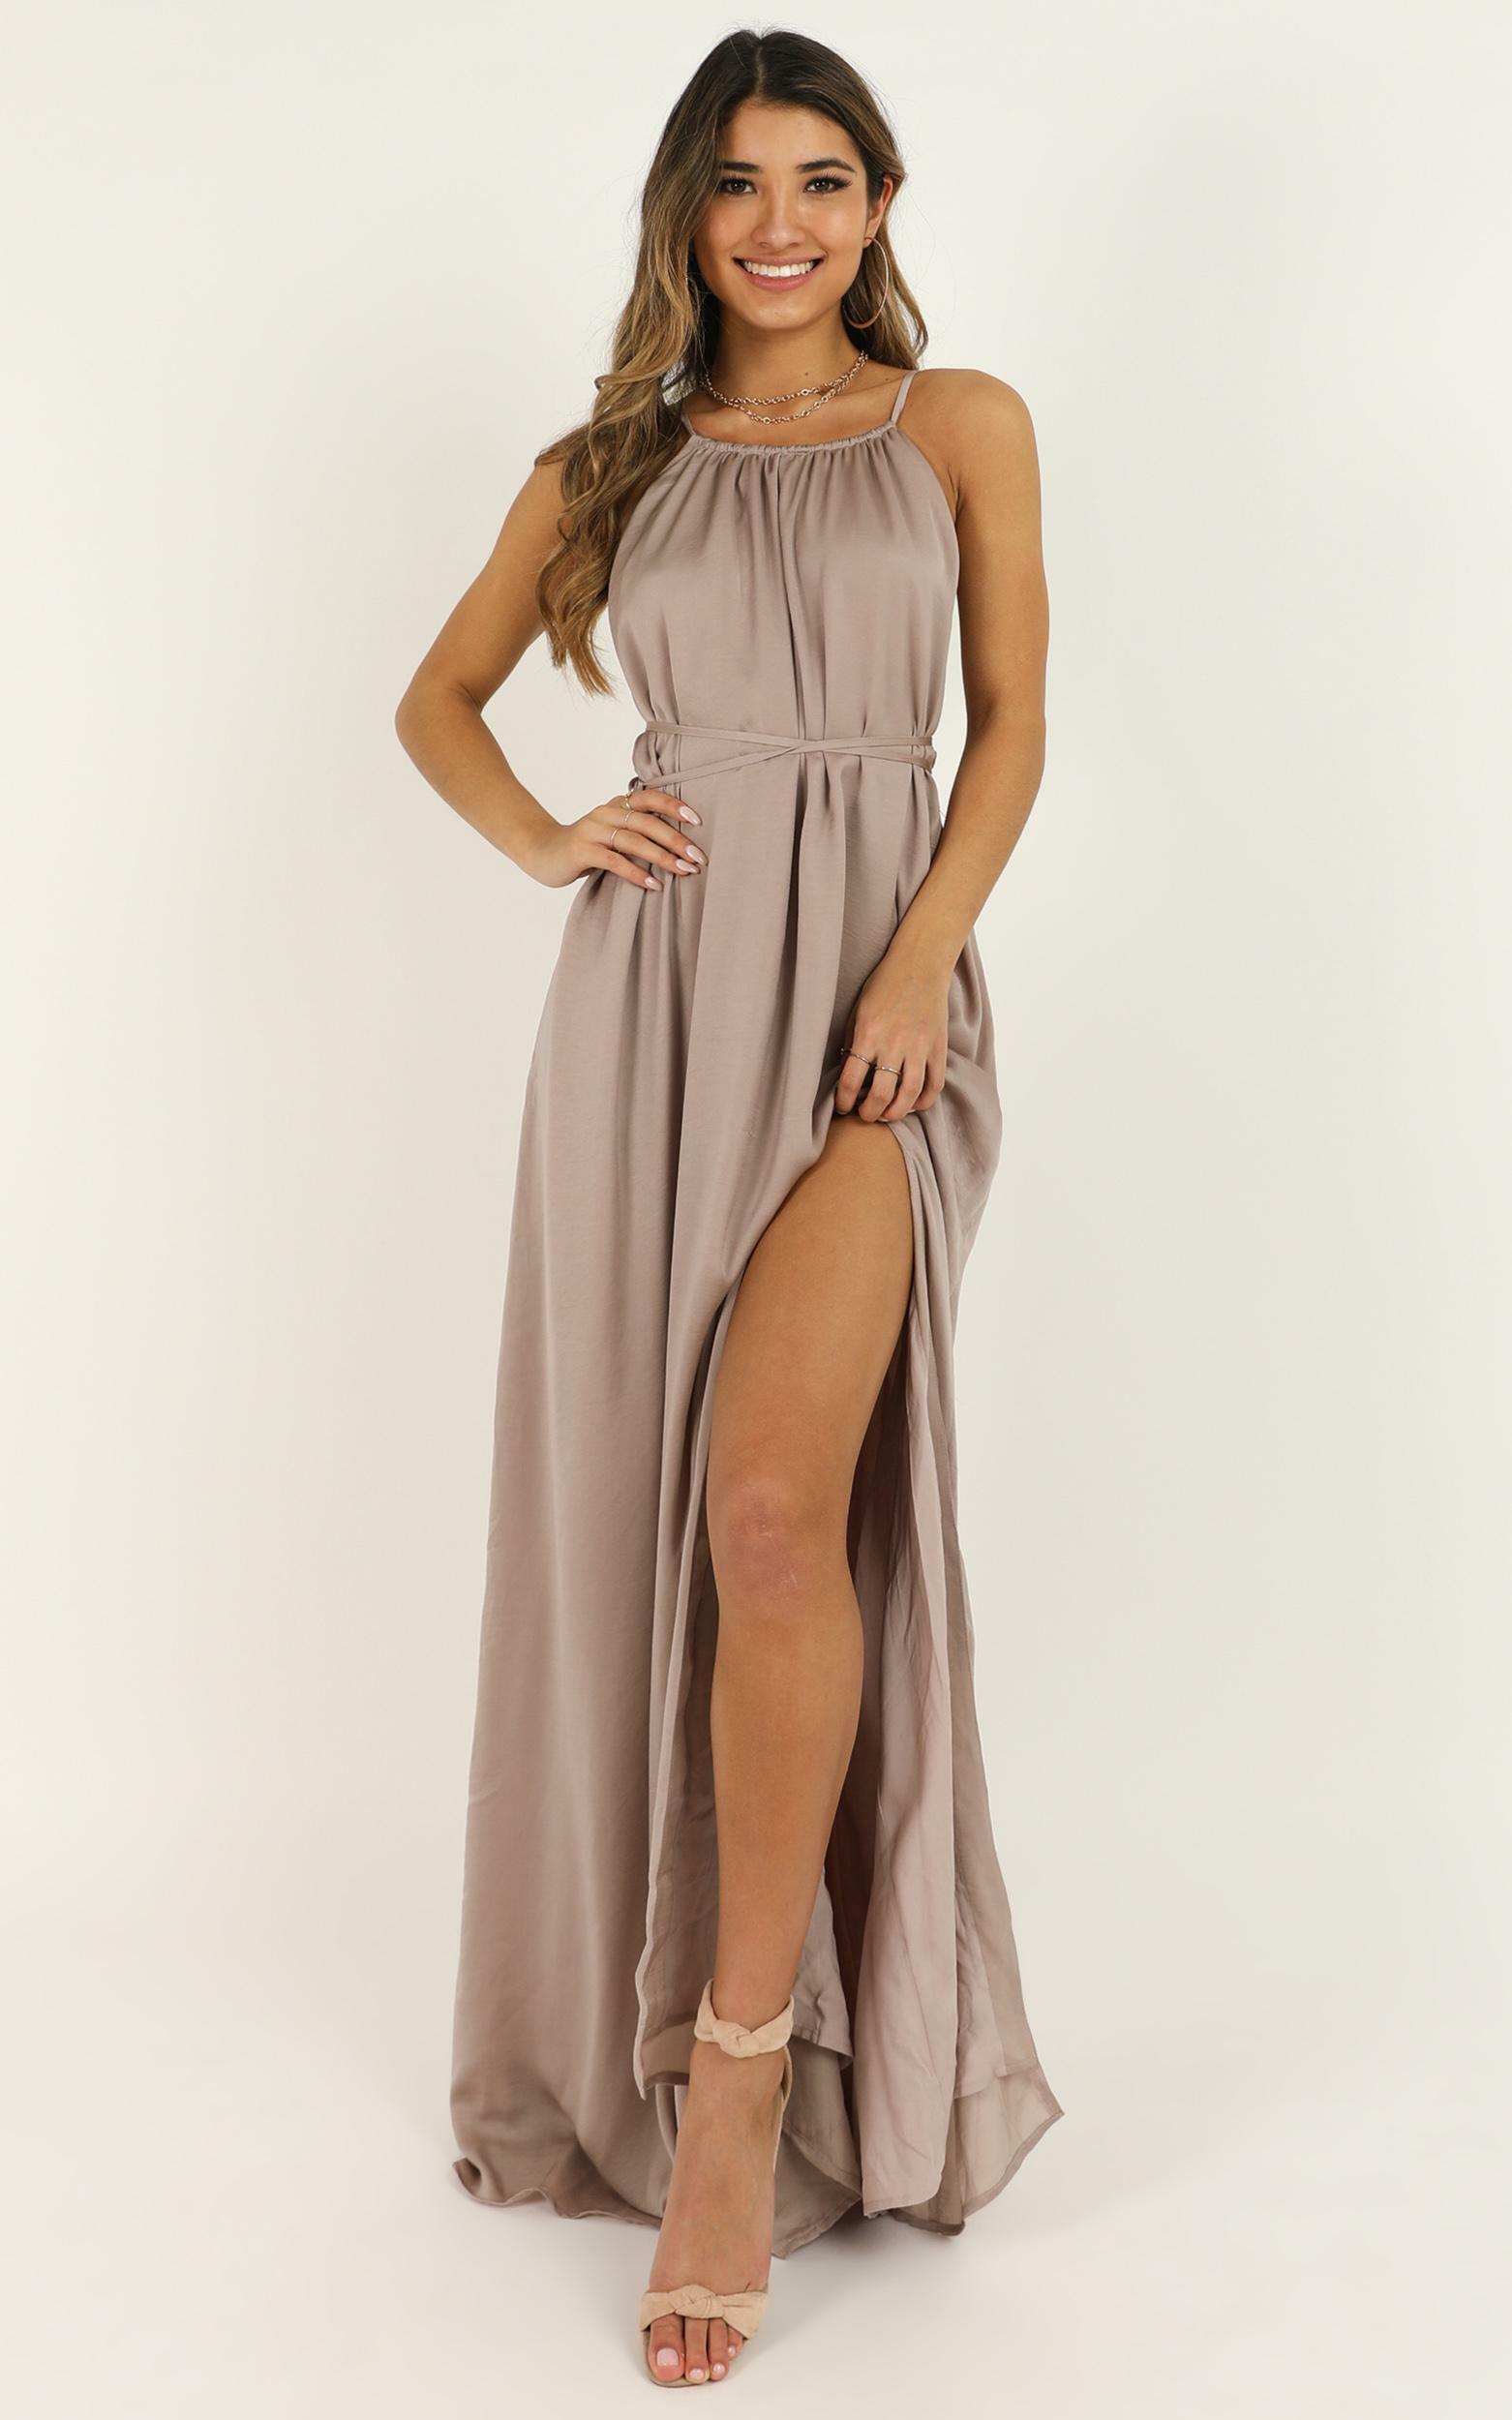 Graceful Dancer Dress in mocha - 20 (XXXXL), Mocha, hi-res image number null